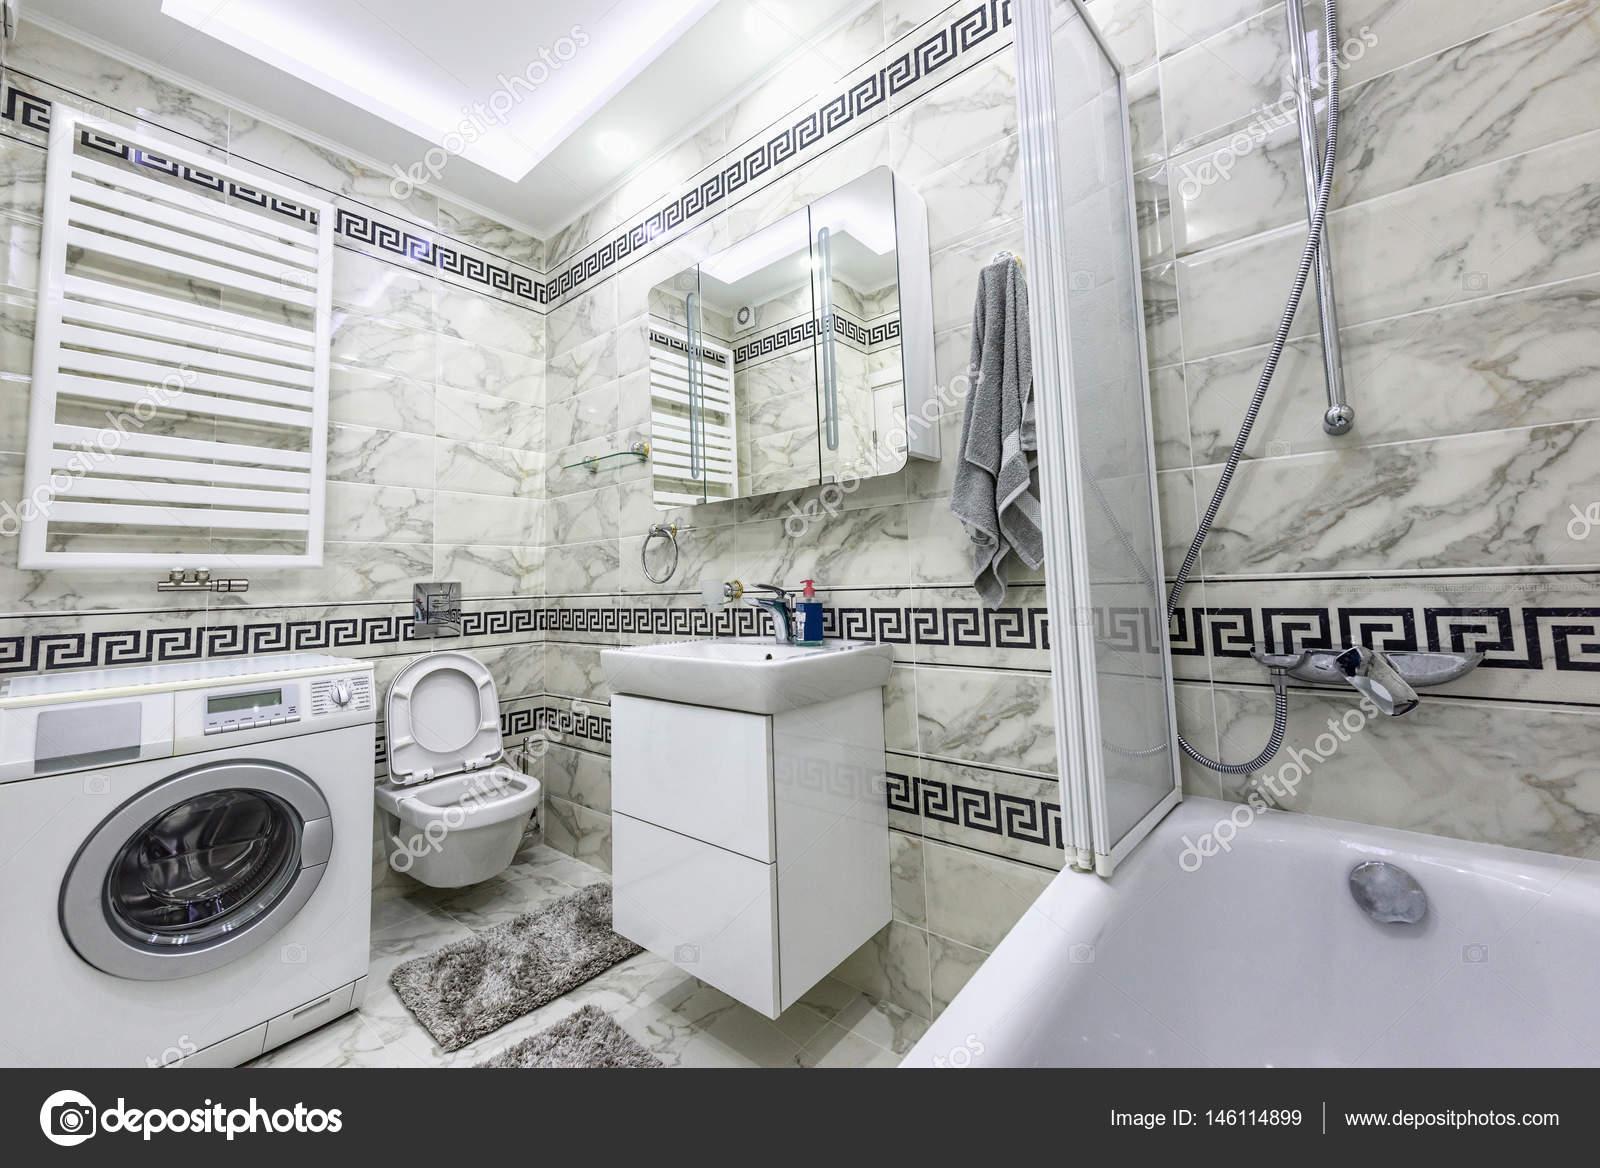 https://st3.depositphotos.com/4758973/14611/i/1600/depositphotos_146114899-stockafbeelding-stockfoto-witte-en-zwarte-kleine.jpg